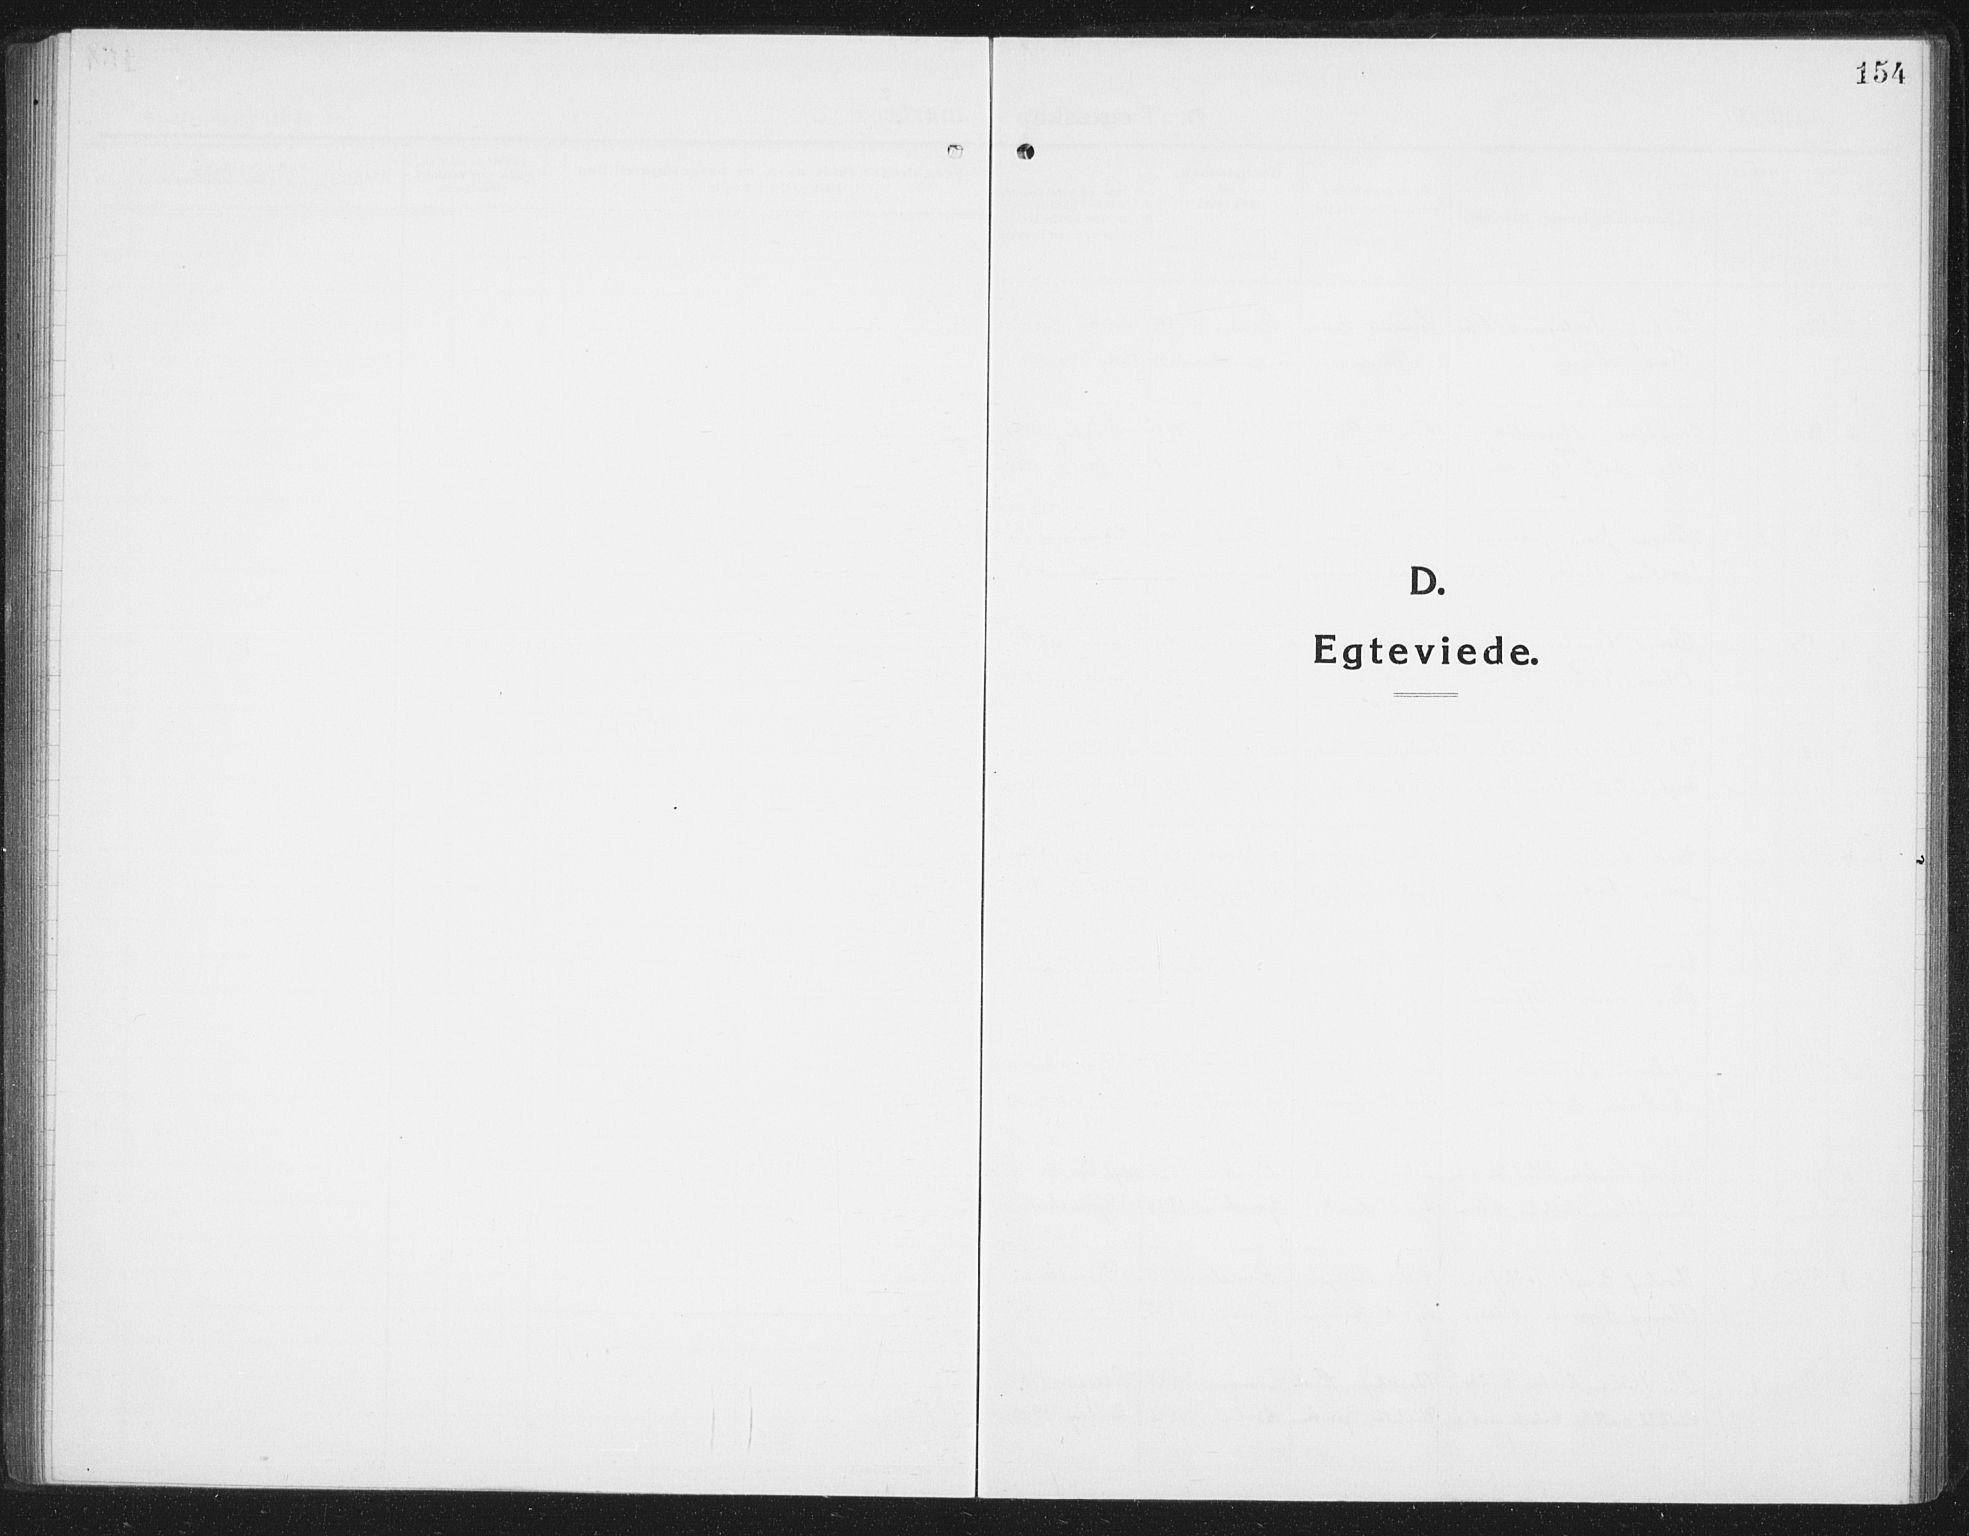 SAT, Ministerialprotokoller, klokkerbøker og fødselsregistre - Nordland, 898/L1428: Klokkerbok nr. 898C03, 1918-1938, s. 154